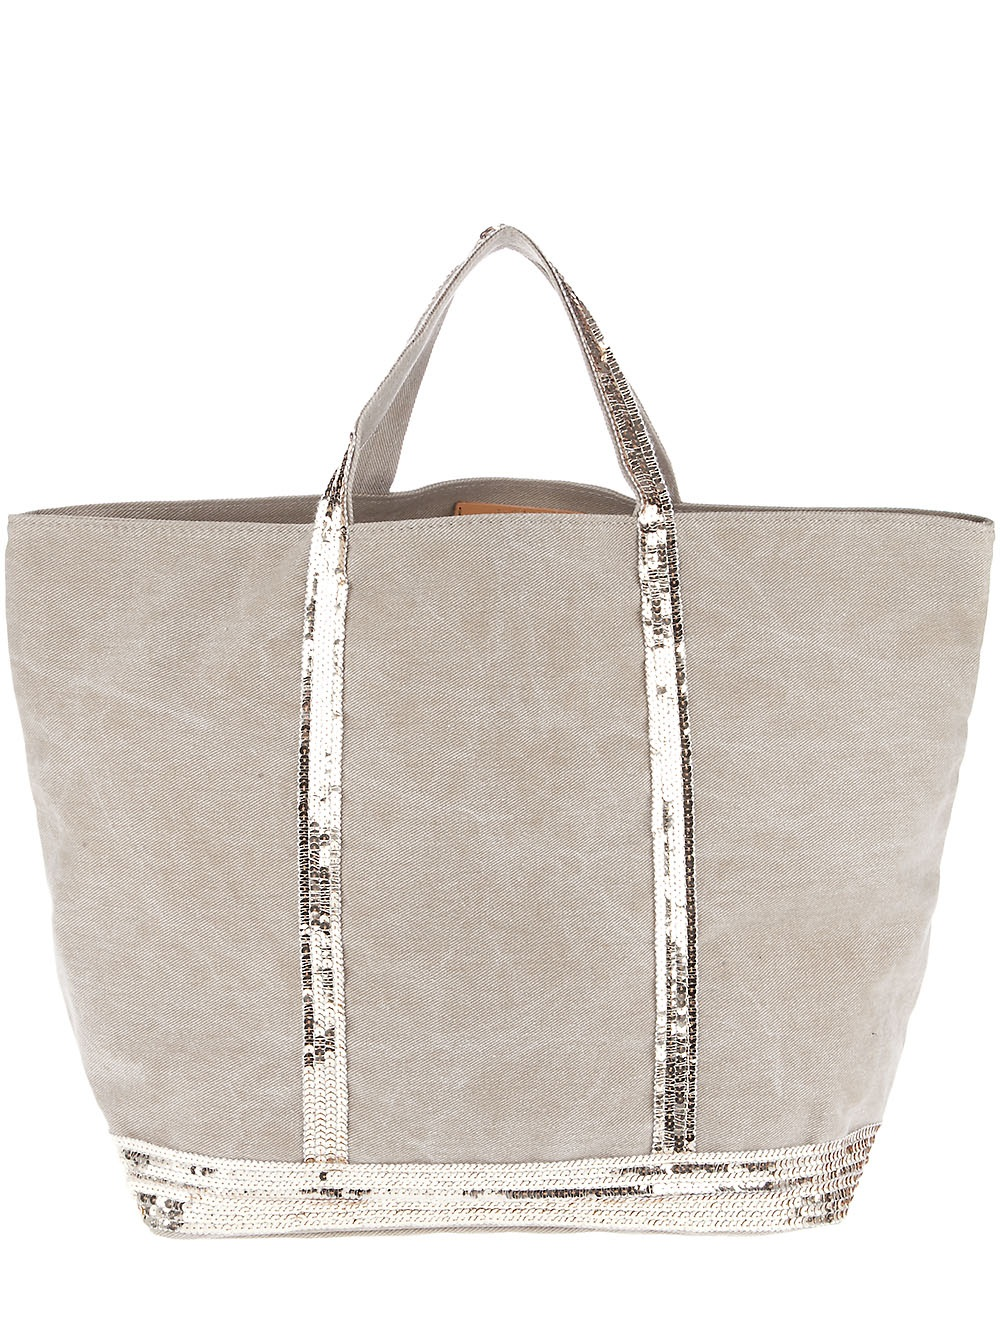 vanessa bruno tote bag mini crossbody bag. Black Bedroom Furniture Sets. Home Design Ideas